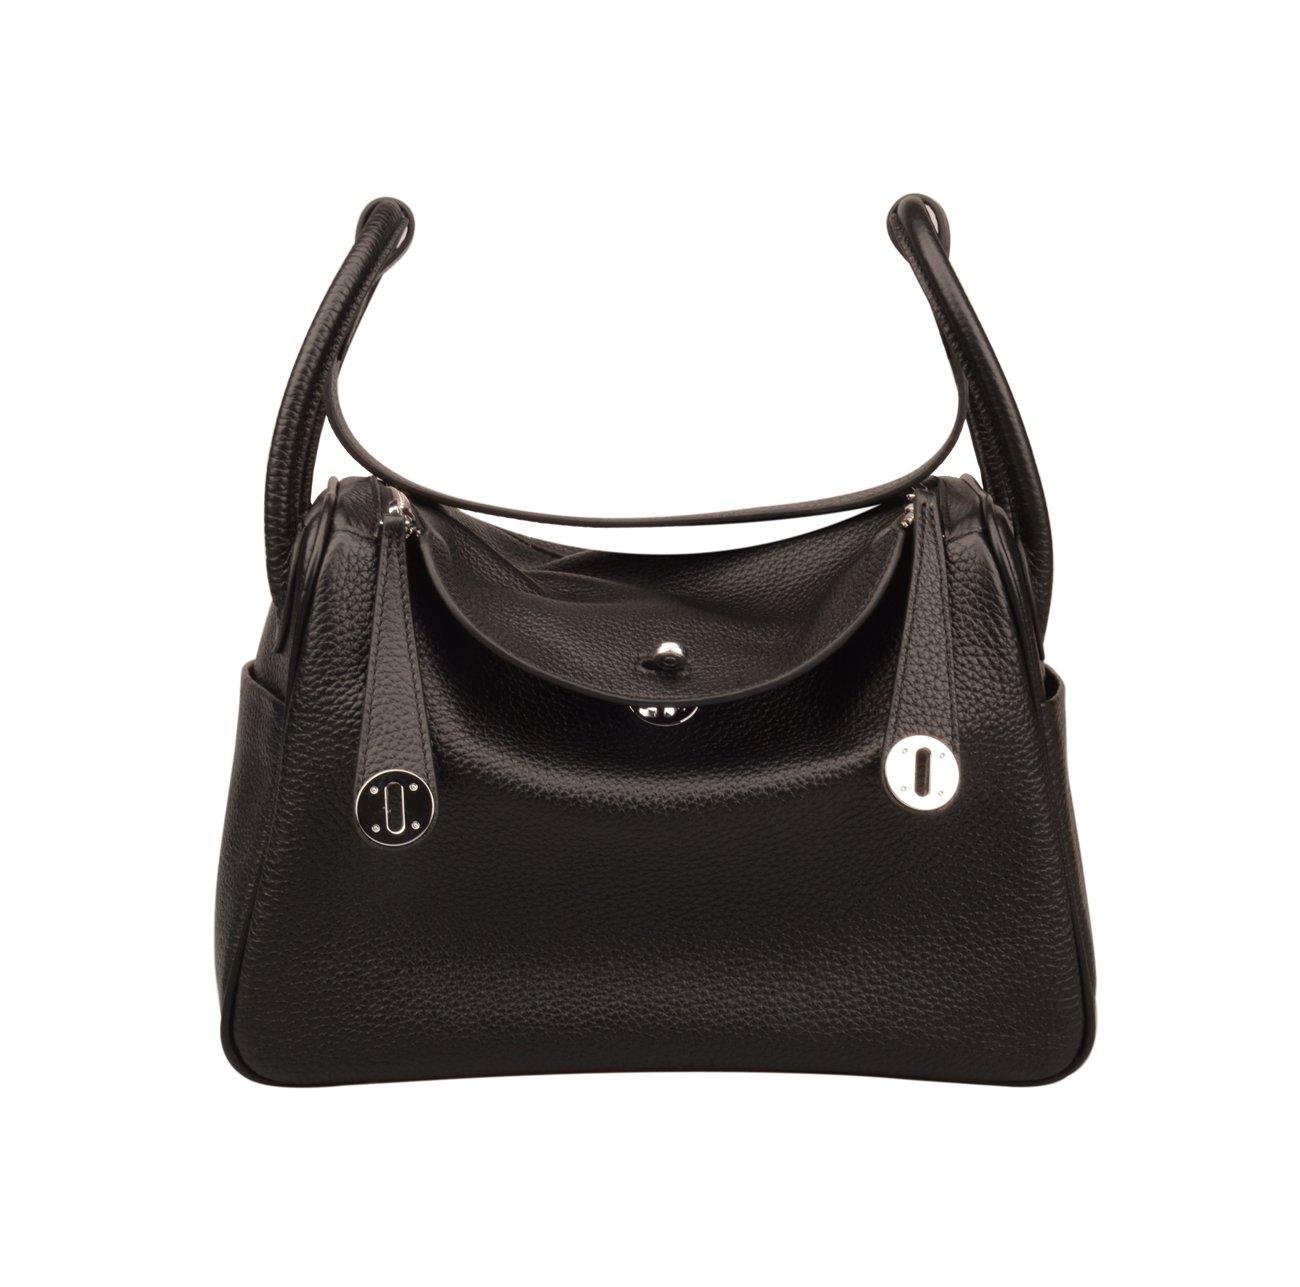 Ainifeel Women's Genuine Leather Shoulder Handbag And Purse Hobo Bag (Black)